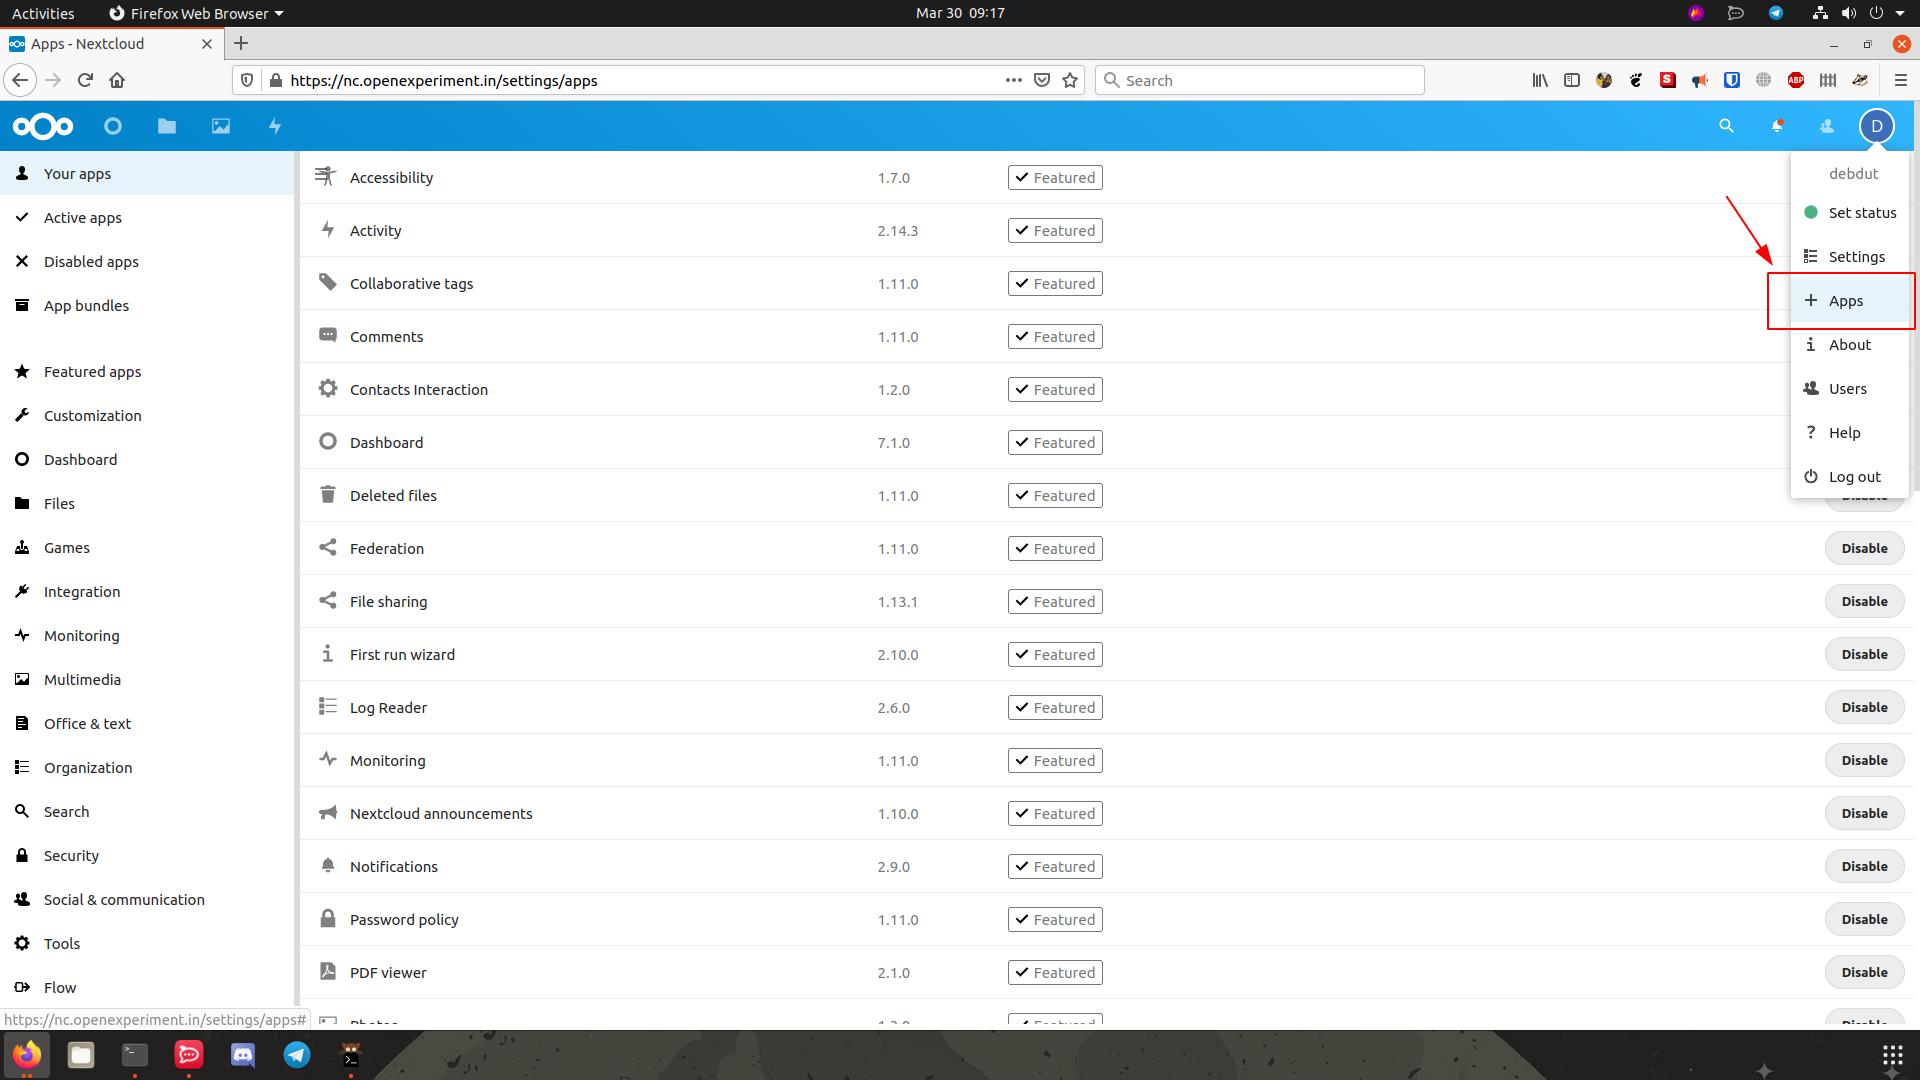 App List for Nextcloud